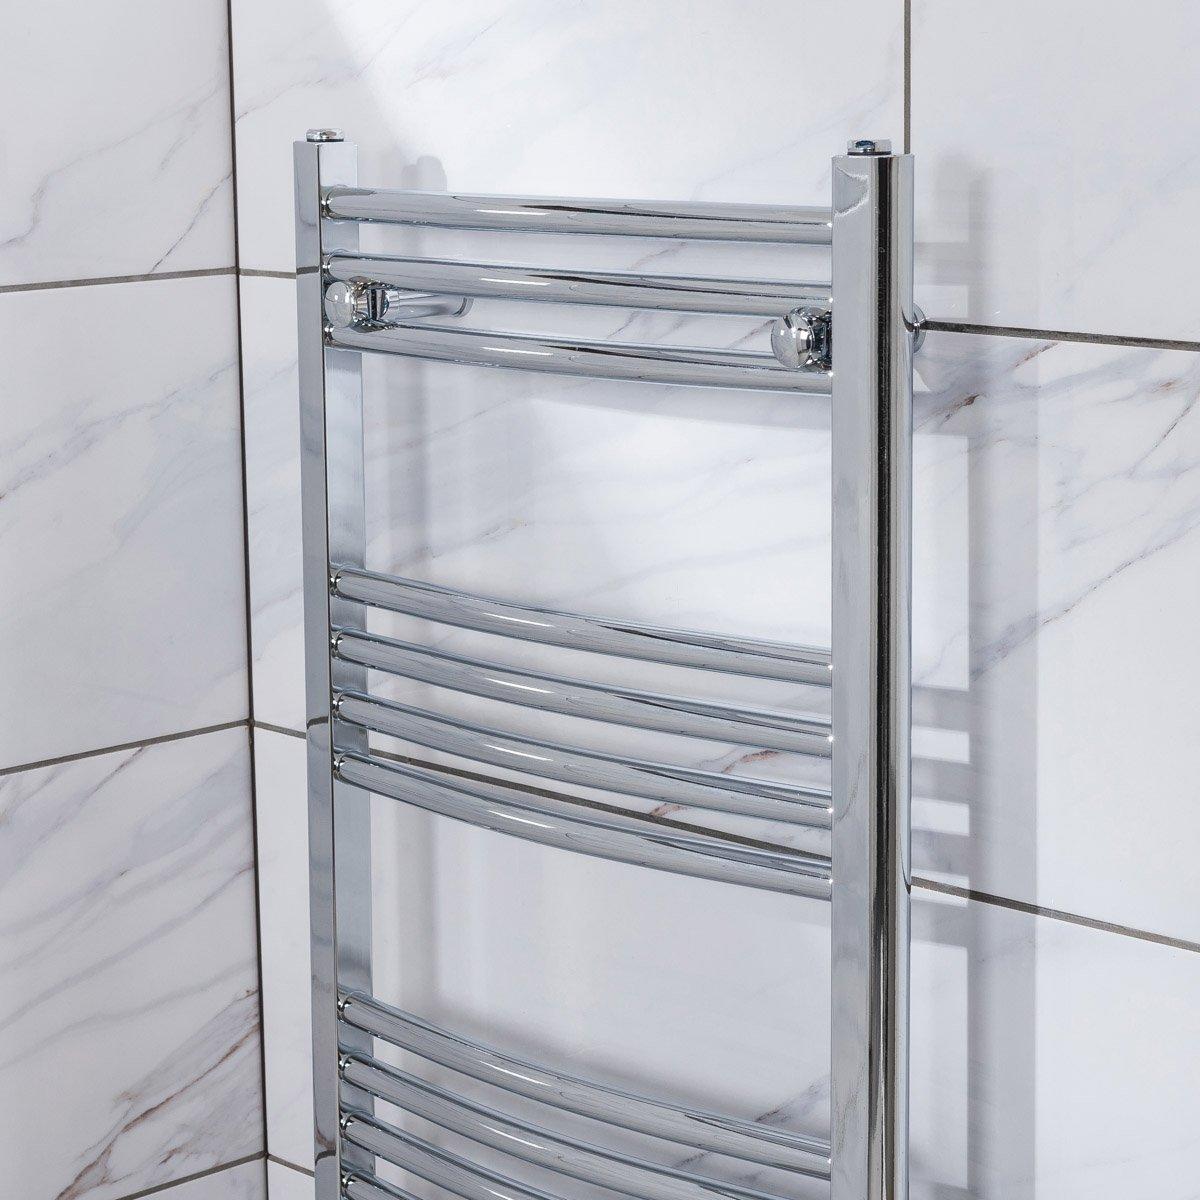 White Bathroom Radiators: Chrome White Curved Bathroom Heated Ladder Towel Rail Rad